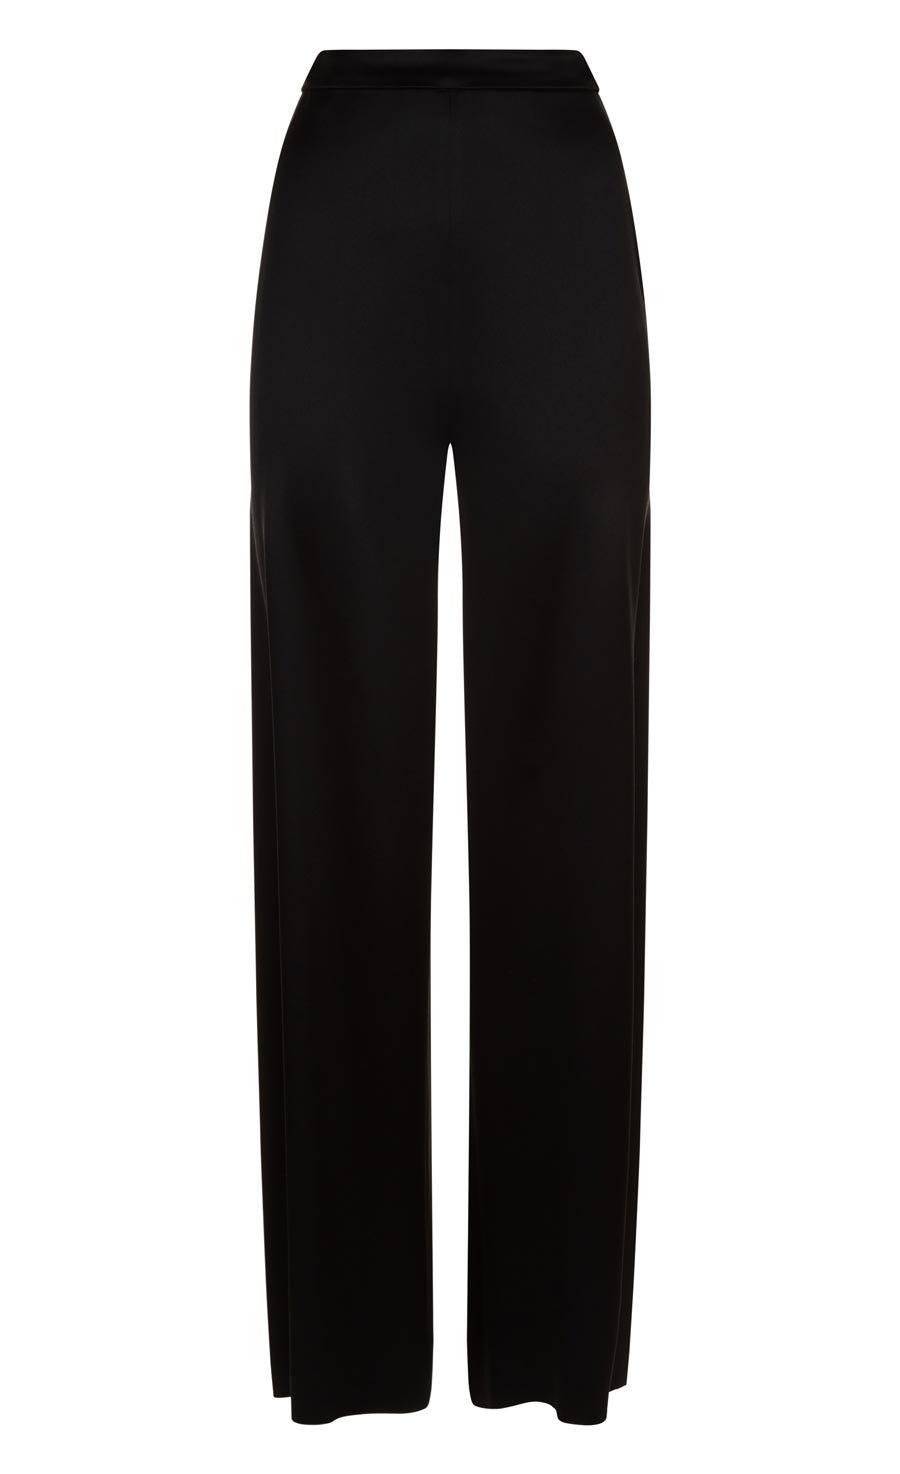 Rising Trousers, Black